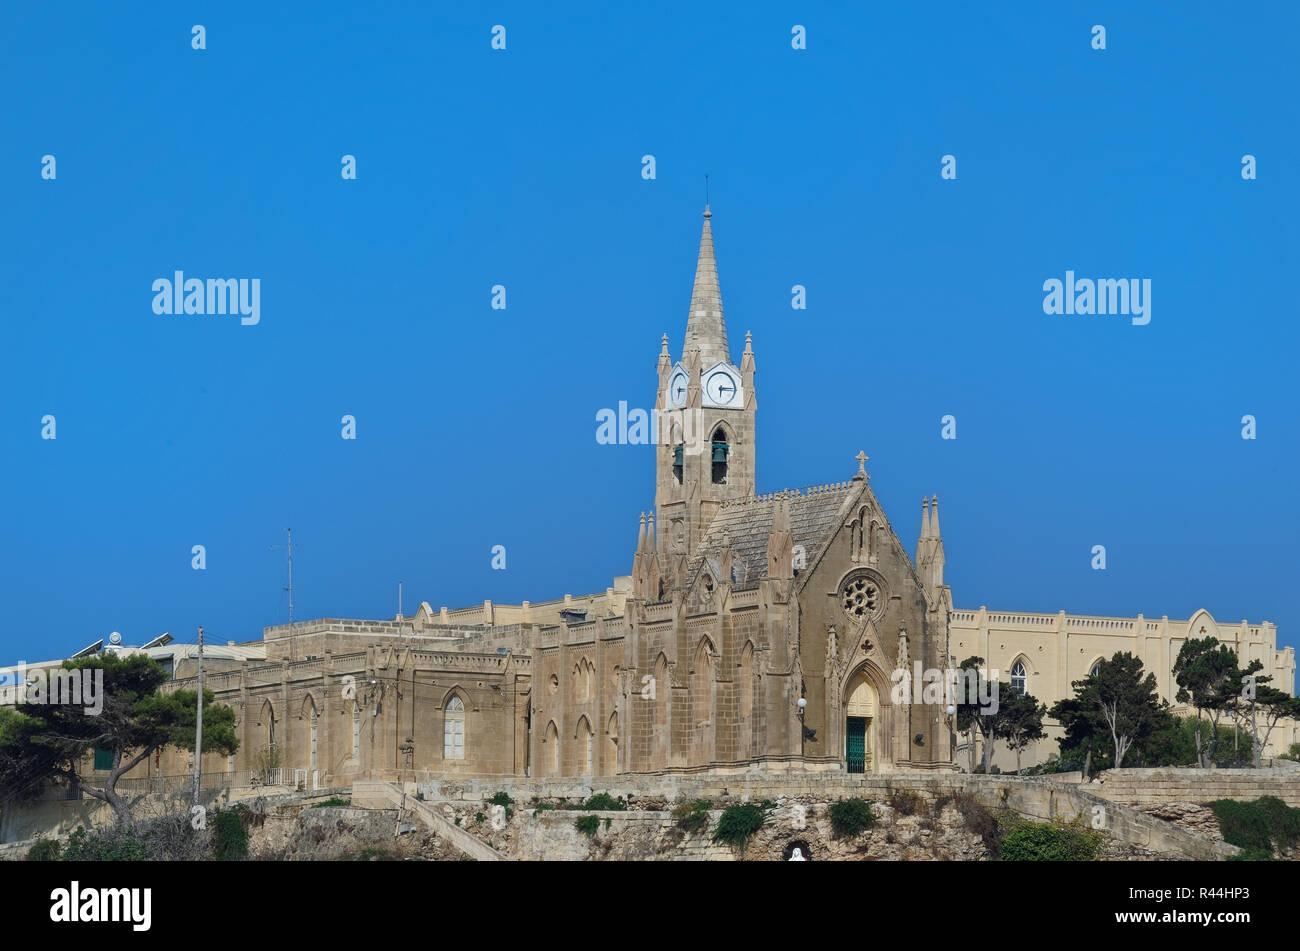 Mgarr Malta Stock Photos Amp Mgarr Malta Stock Images Alamy